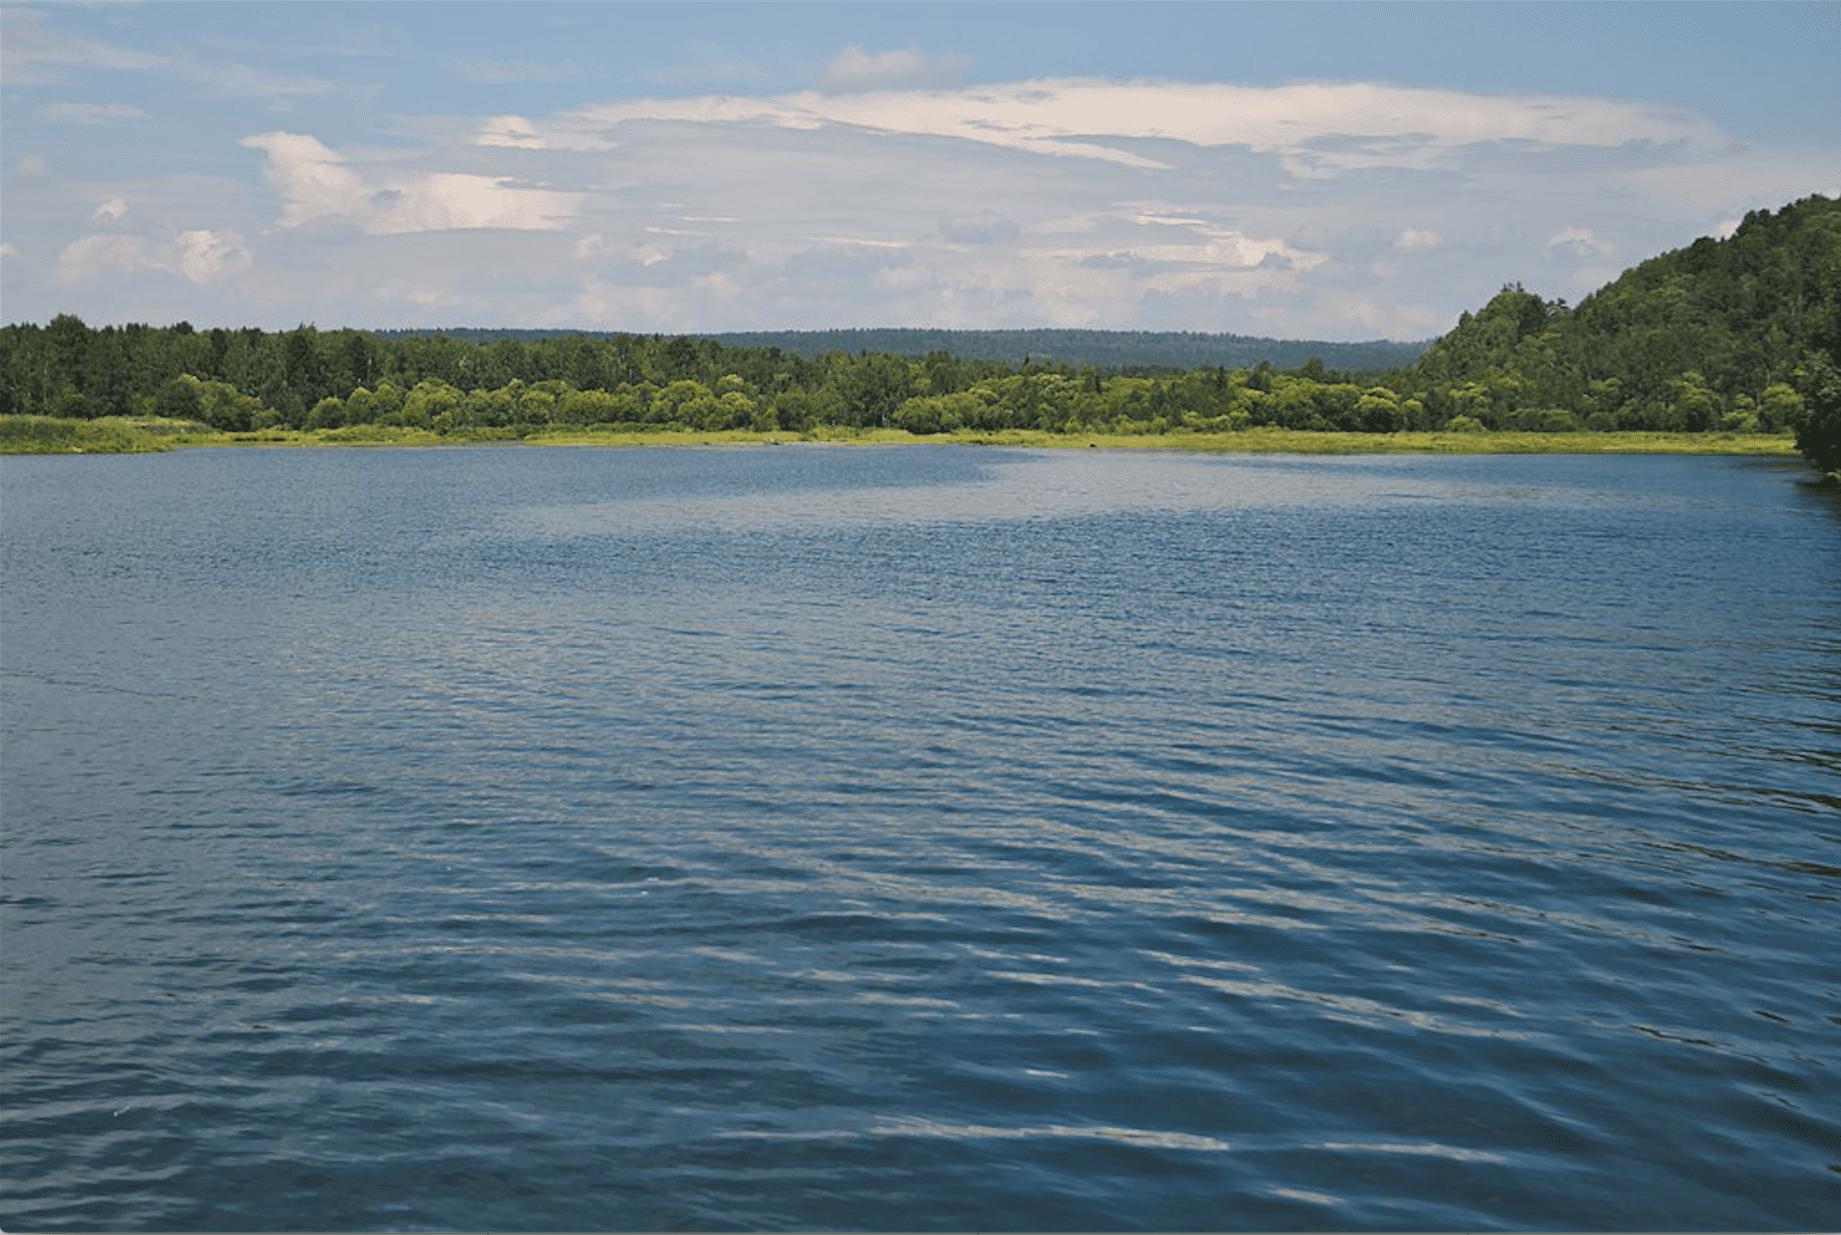 Angara River in Summer